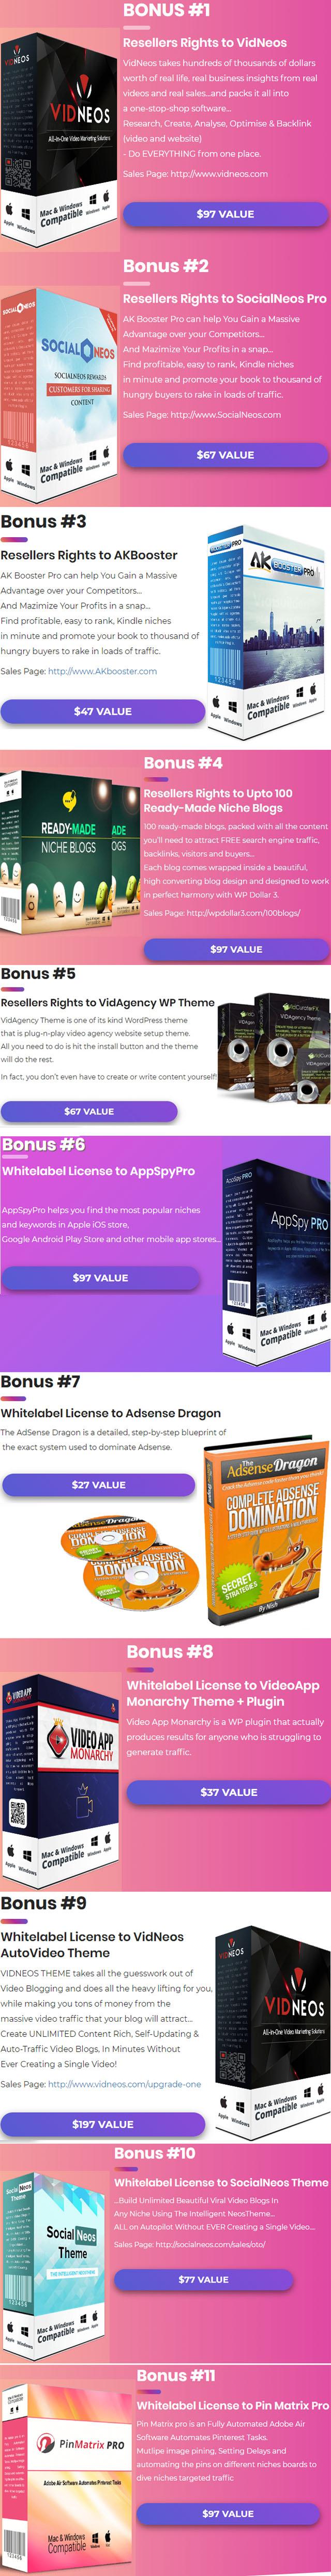 buyers-bonuses